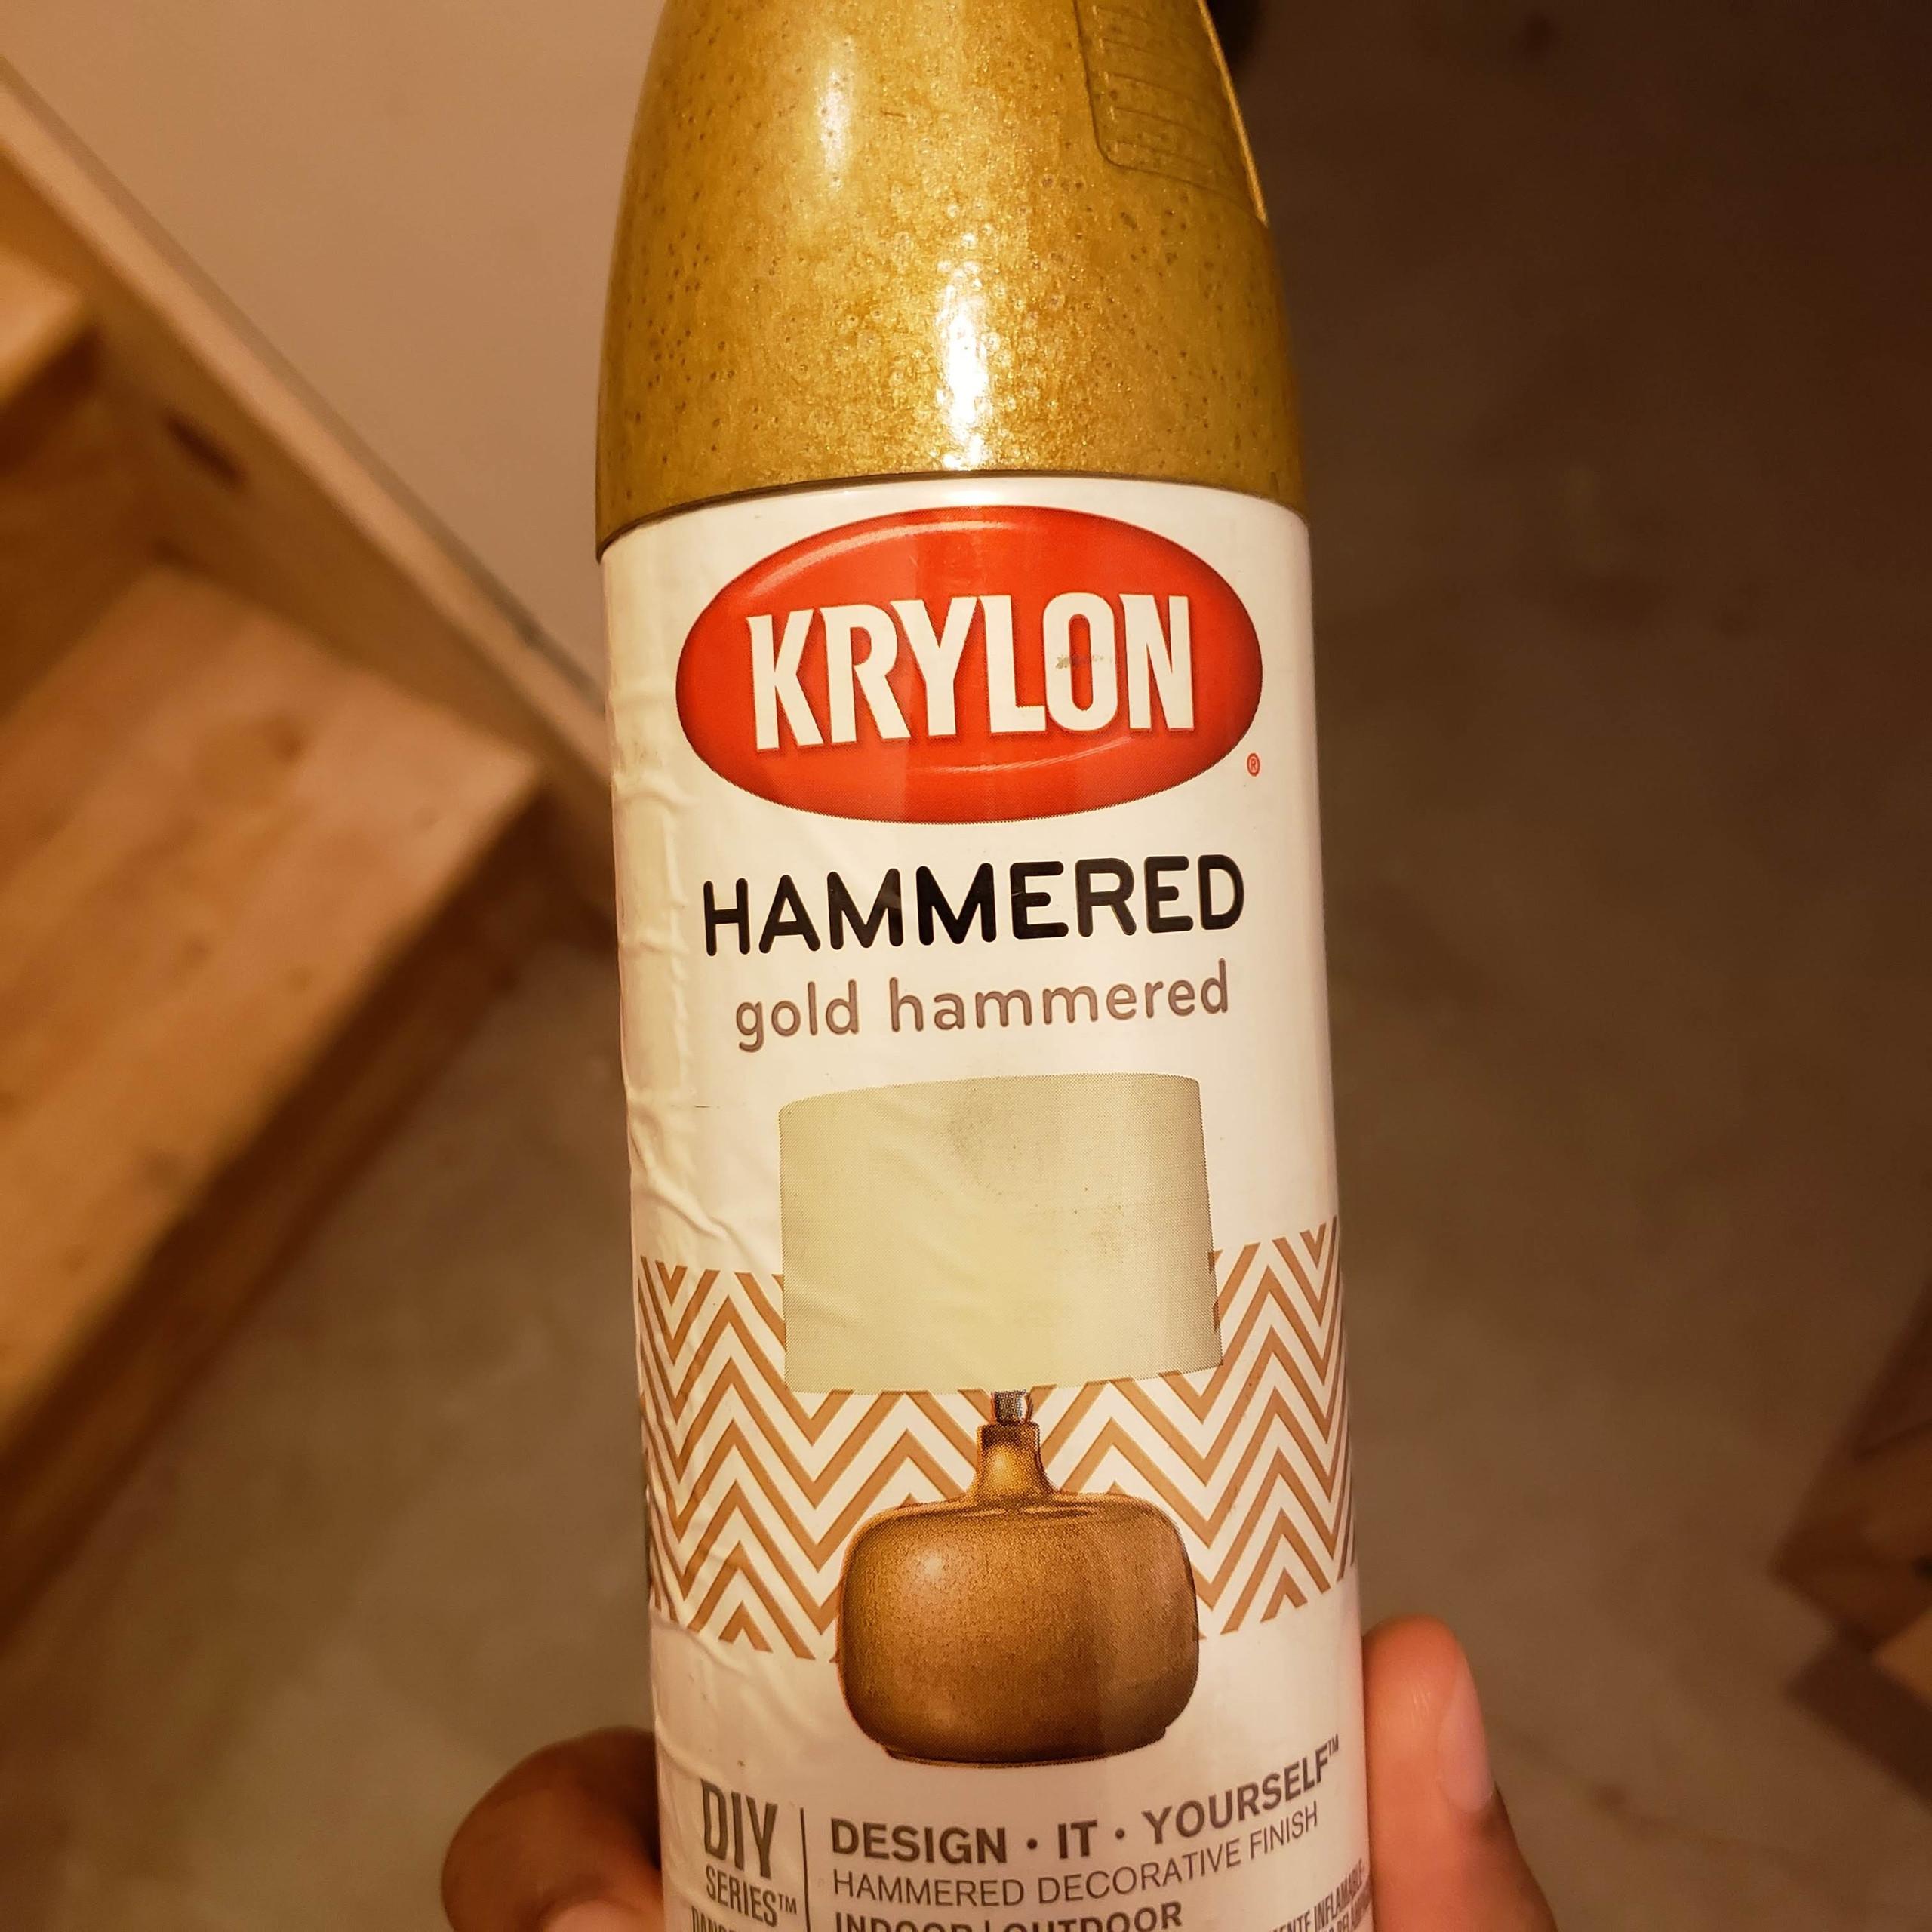 krylon hammered gold, wood shop, DIY, Wood projects, wood frame, shadow box, crayola crayon, dremel router, inlay, epoxy